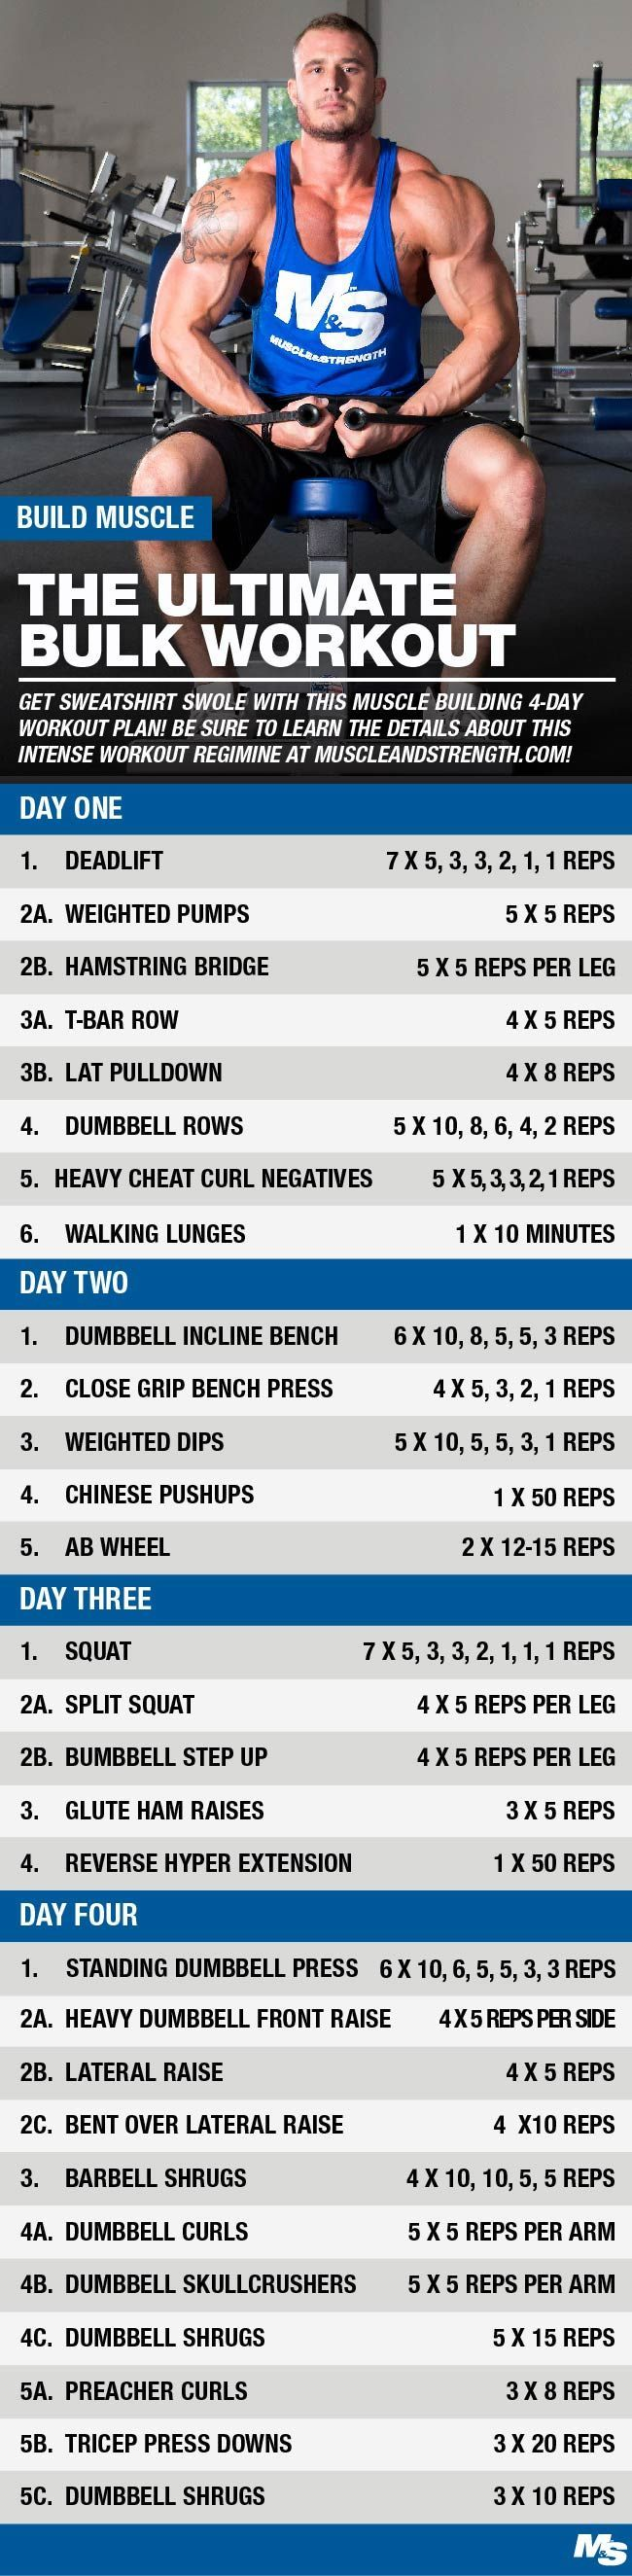 Sweatshirt Swole: The Ultimate Bulking Workout Plan #fitness #fitnessworkouts